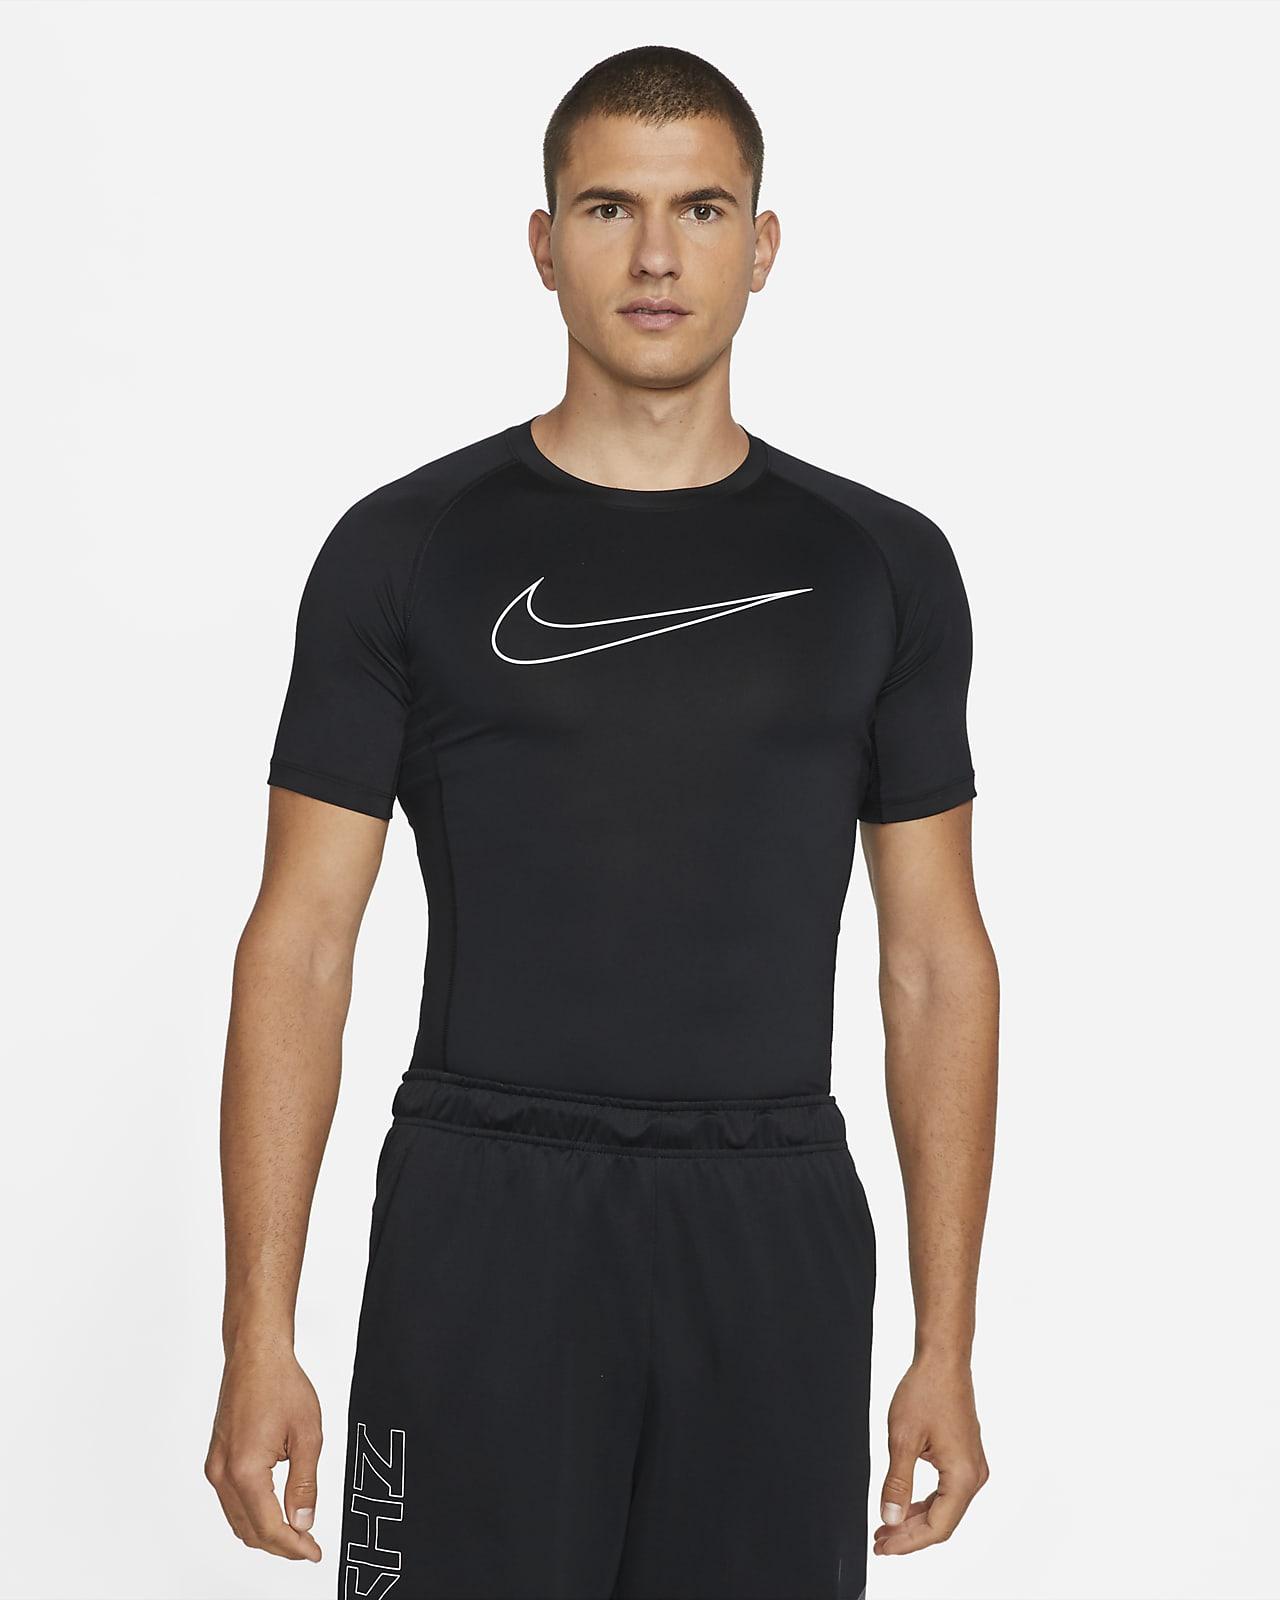 Playera para la parte superior de manga corta con ajuste ceñido para hombre Nike Pro Dri-FIT